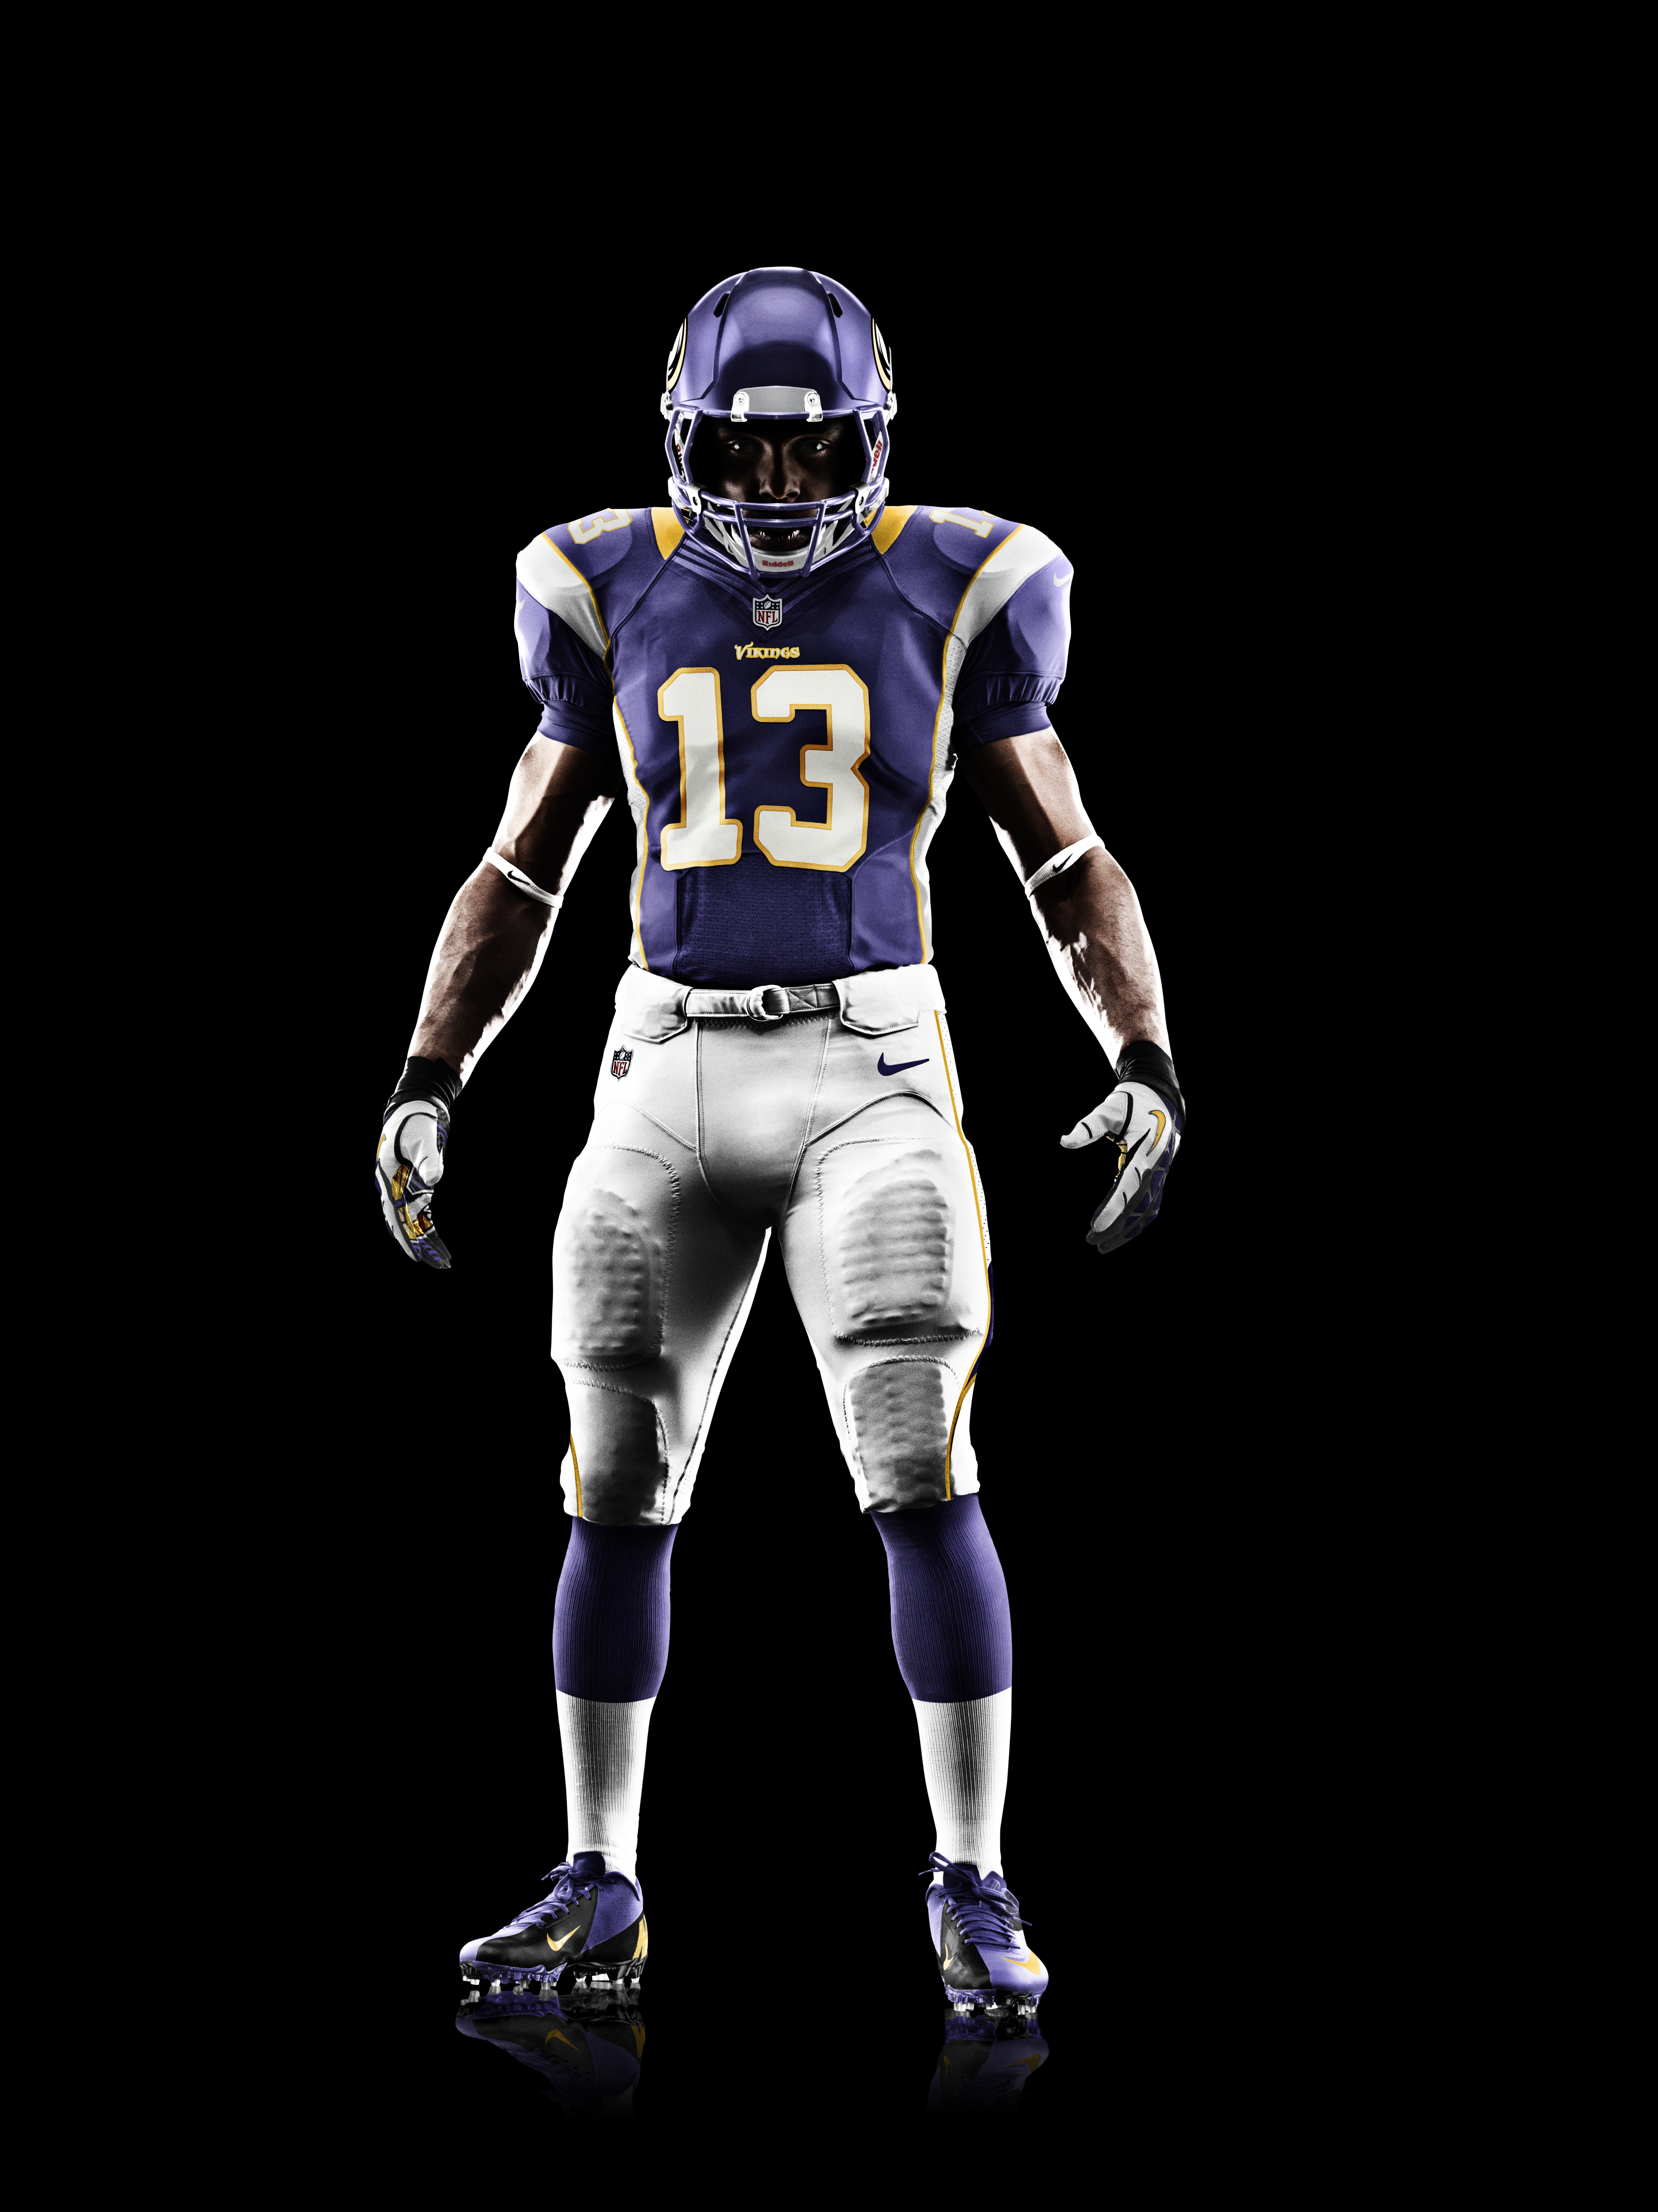 Nike News - Minnesota Vikings 2012 Nike Football Uniform